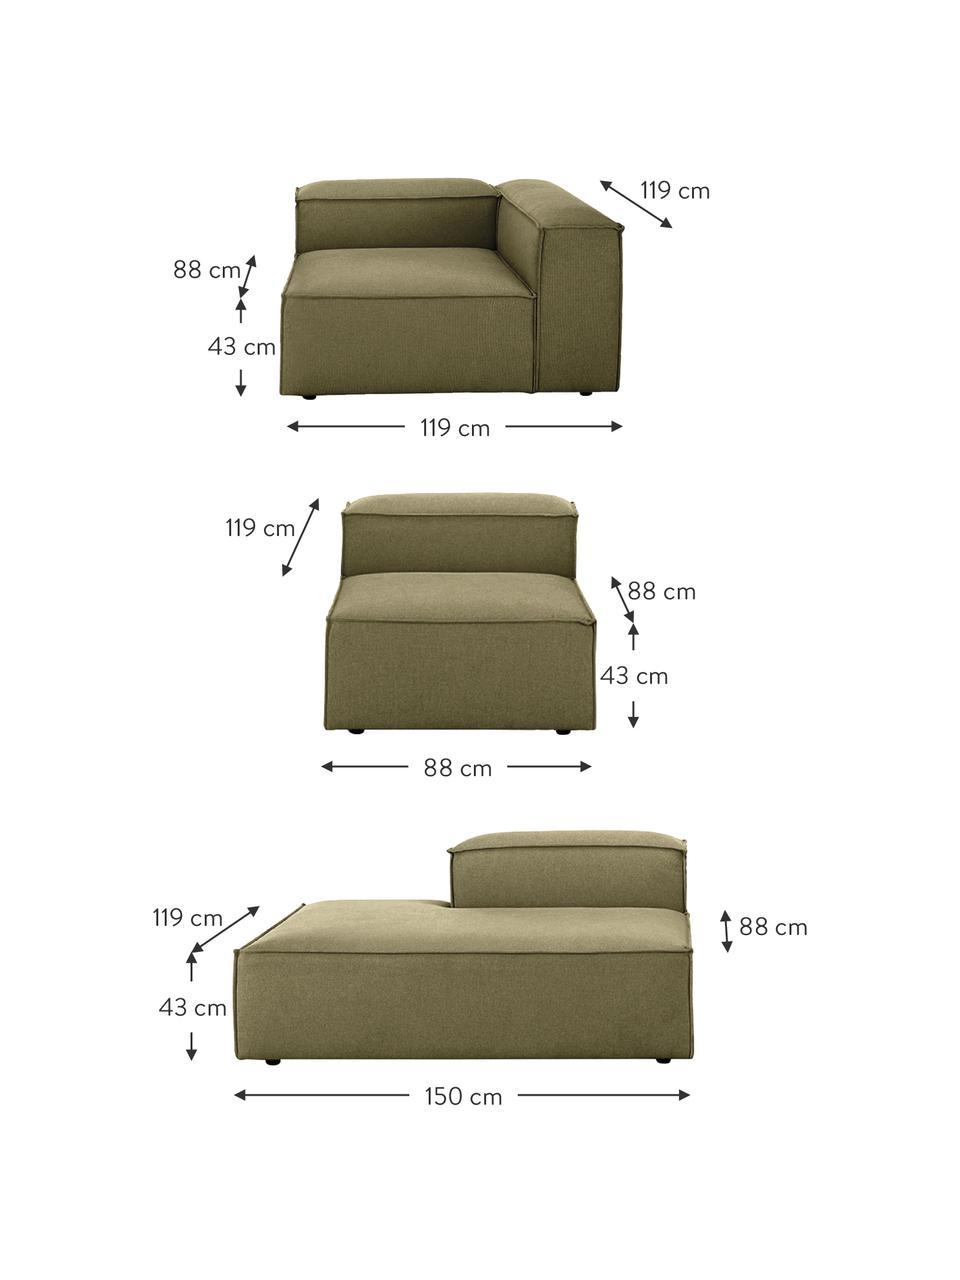 Modulaire XL chaise longue Lennon in groen, Bekleding: polyester De hoogwaardige, Frame: massief grenenhout, multi, Poten: kunststof De poten bevind, Geweven stof groen, B 357 x D 119 cm